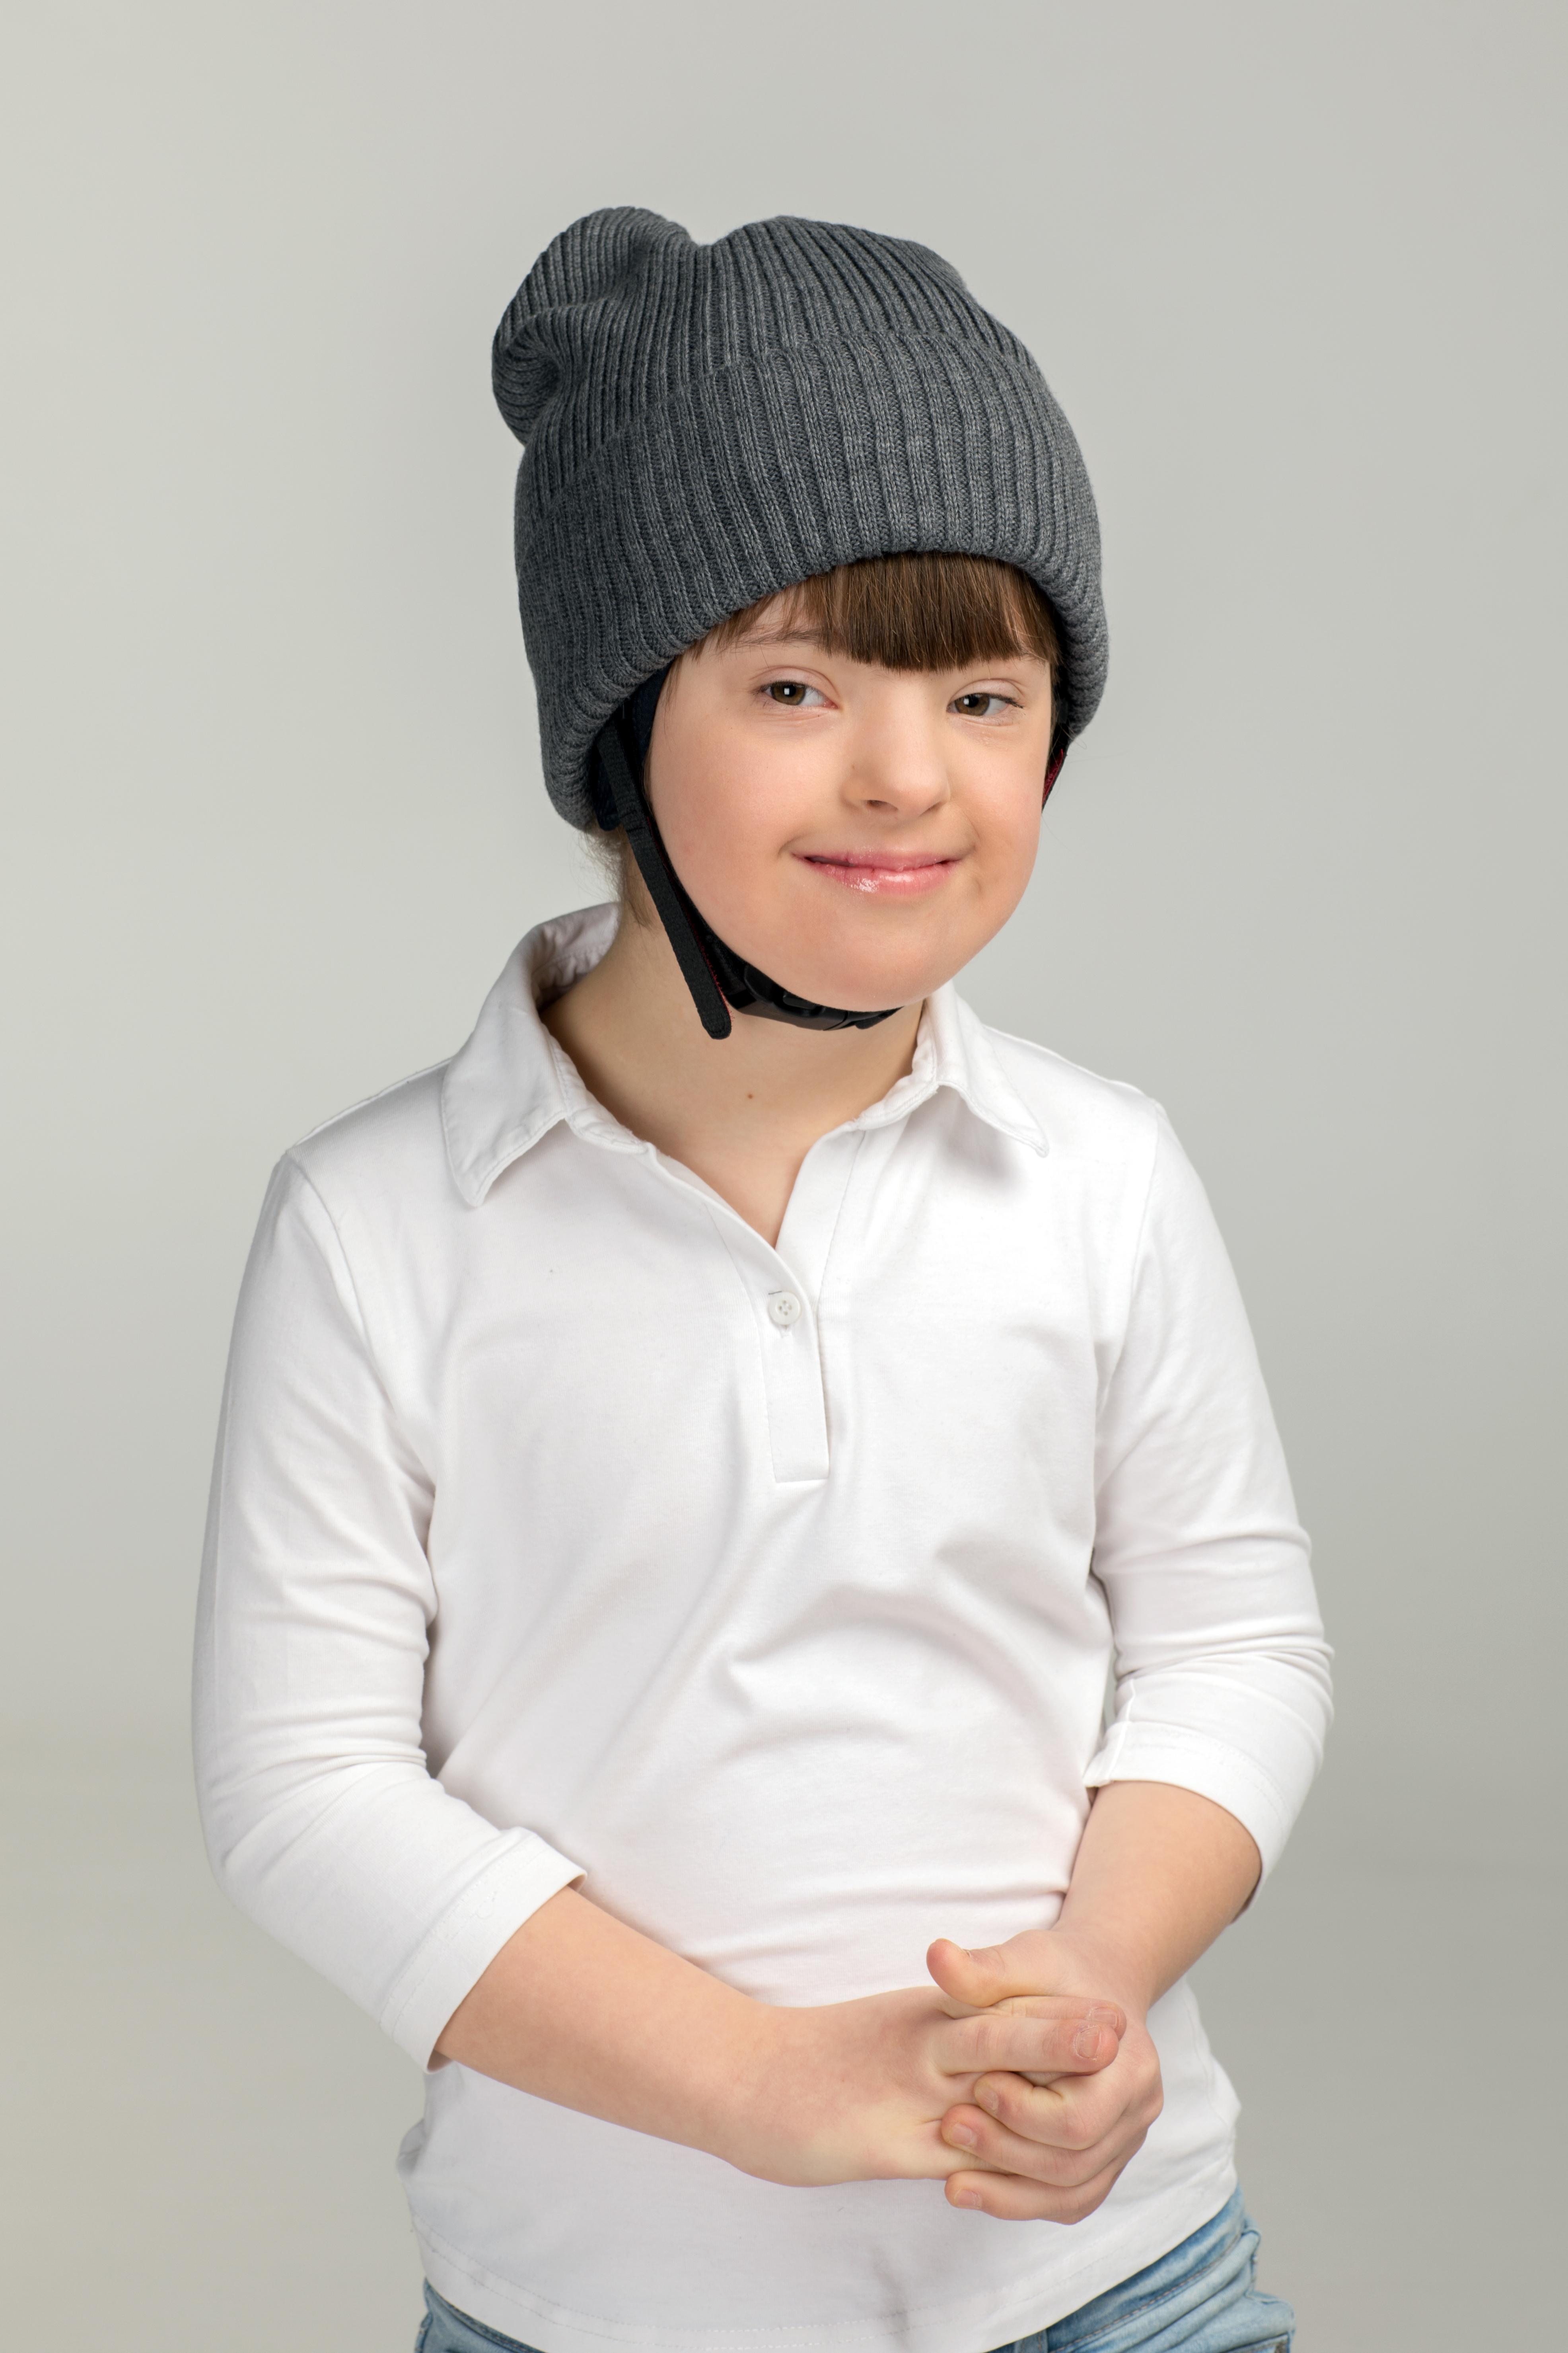 Soft Protective Helmets